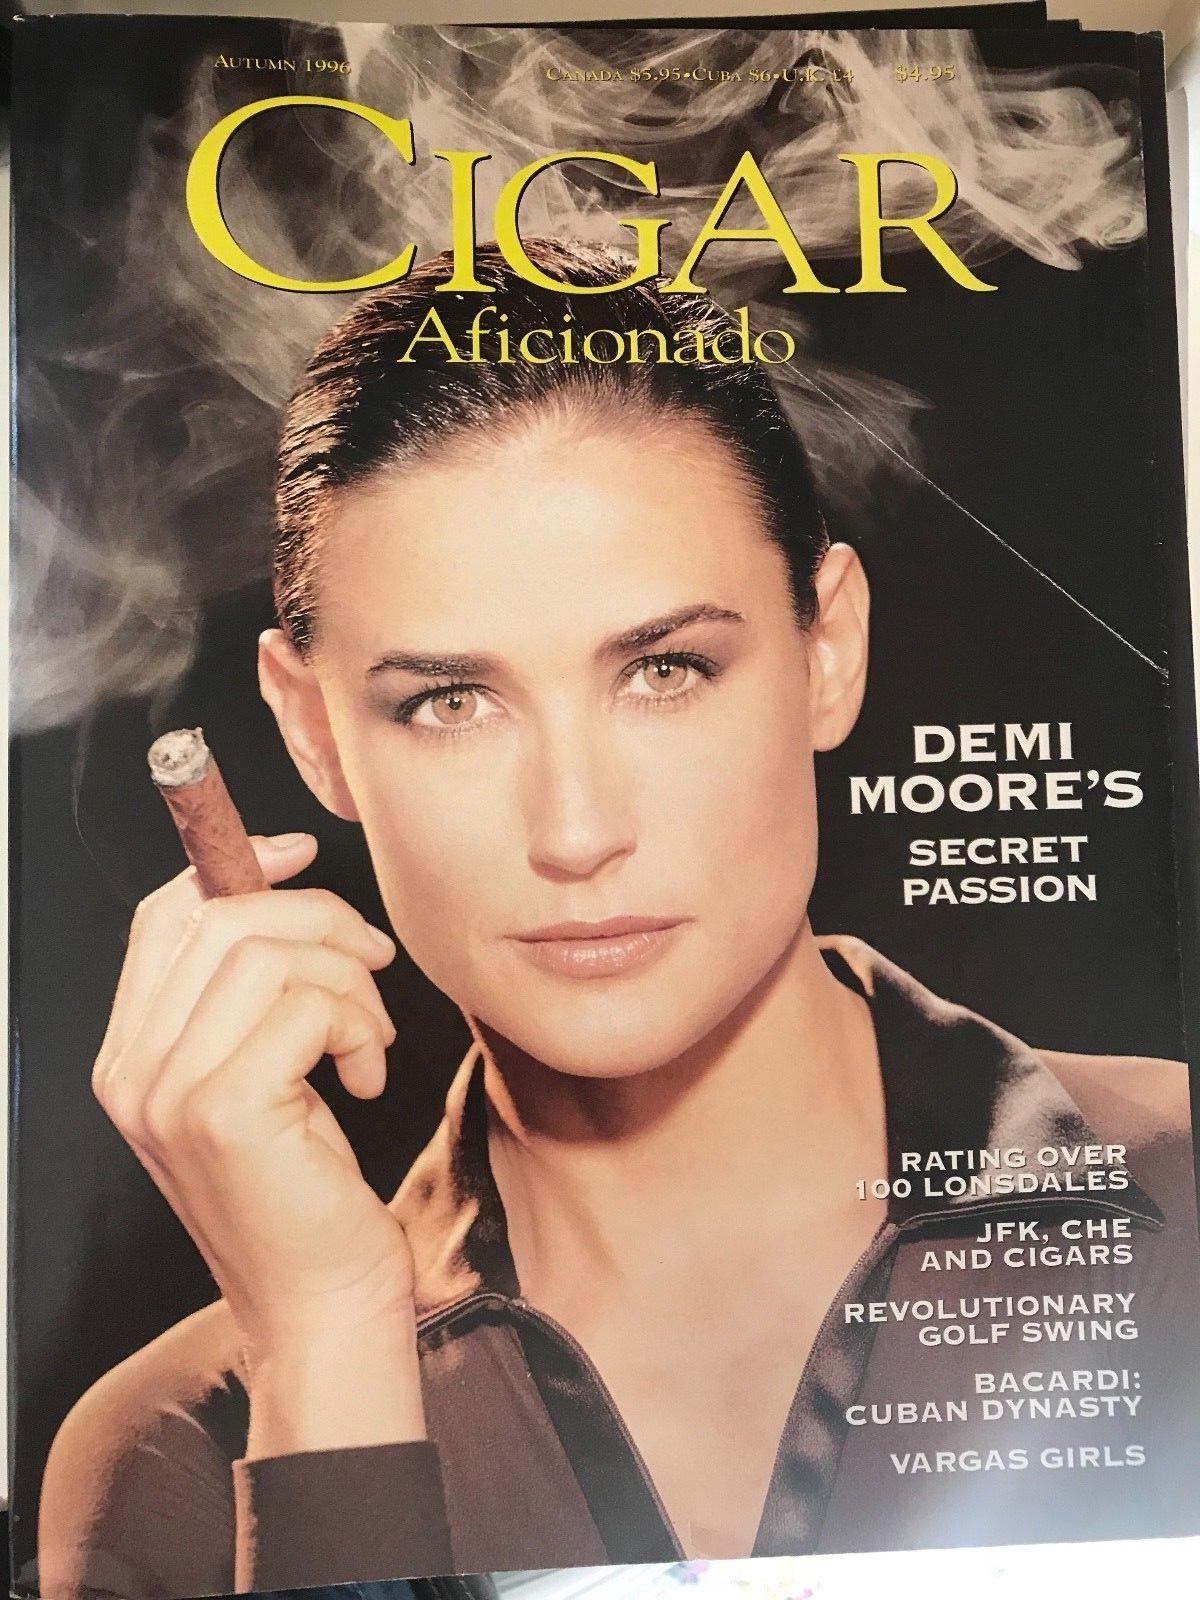 autumn1996-cigar-aficionado-demi-moore.jpg